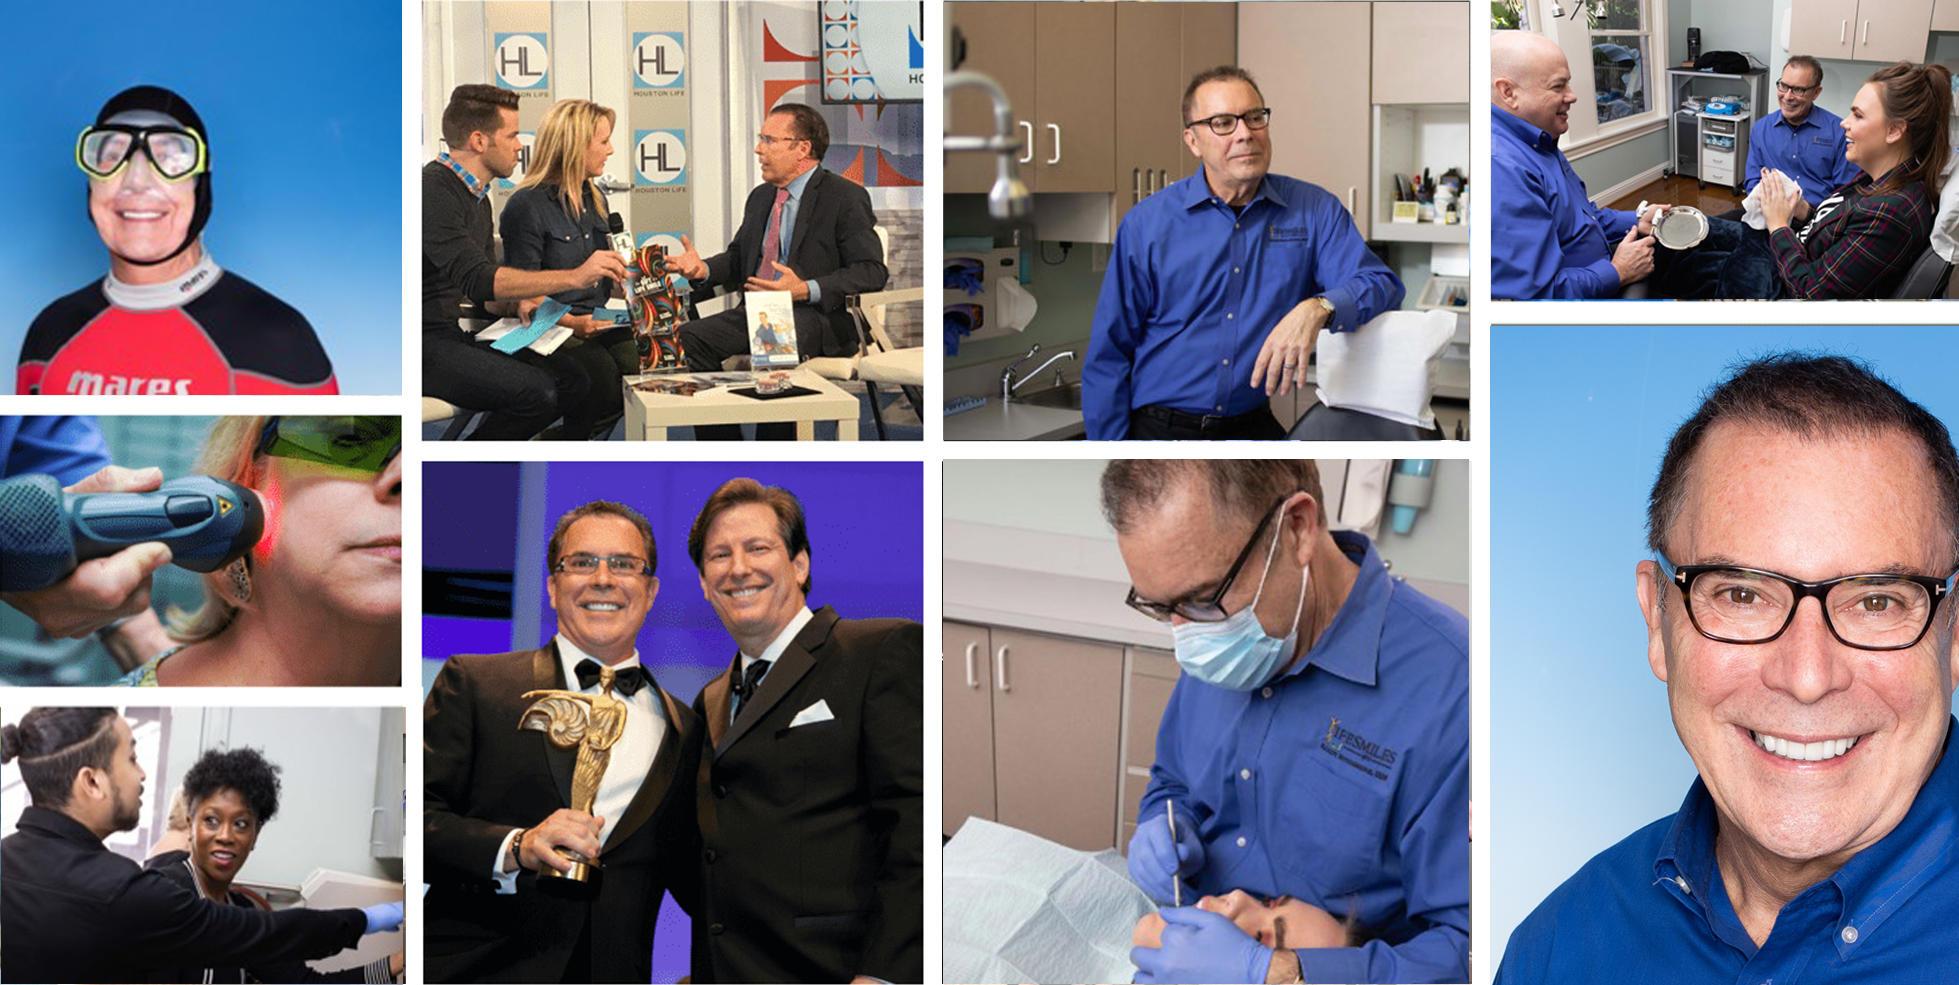 Houston Dentist Photos